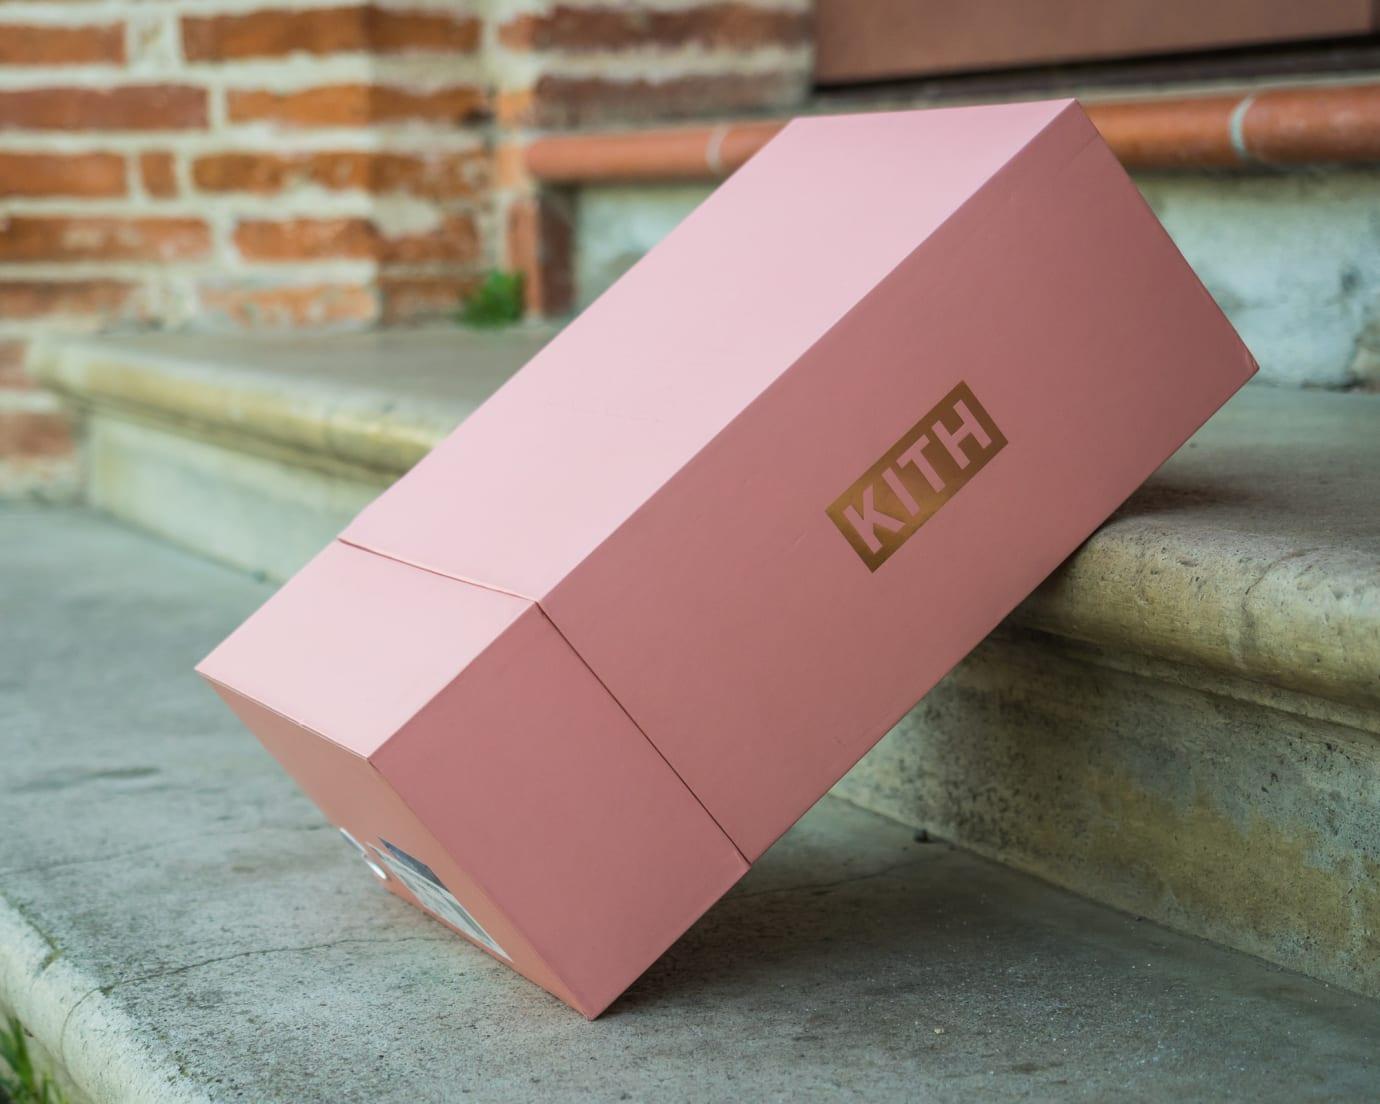 new york 7f5f9 0659c ... Kith Adidas Ultra Boost Ace 16 Pure Control Flamingo Box